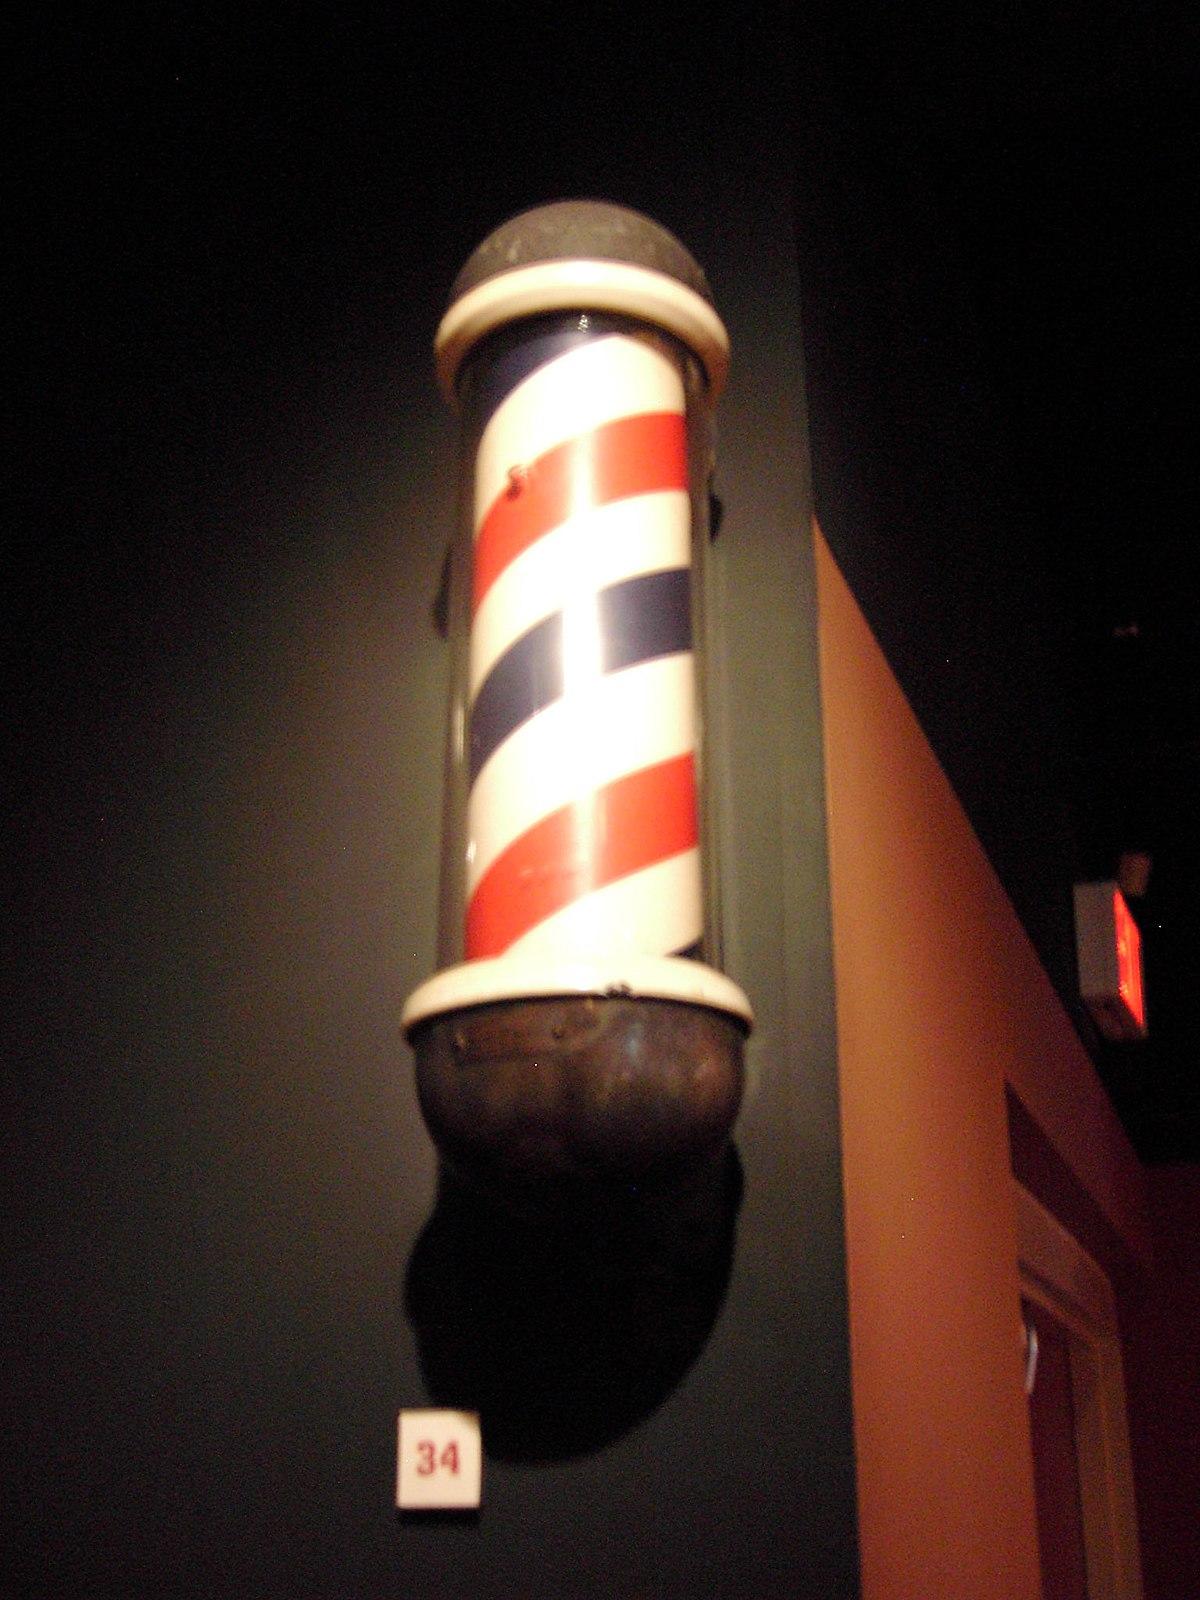 Electric Barber Pole